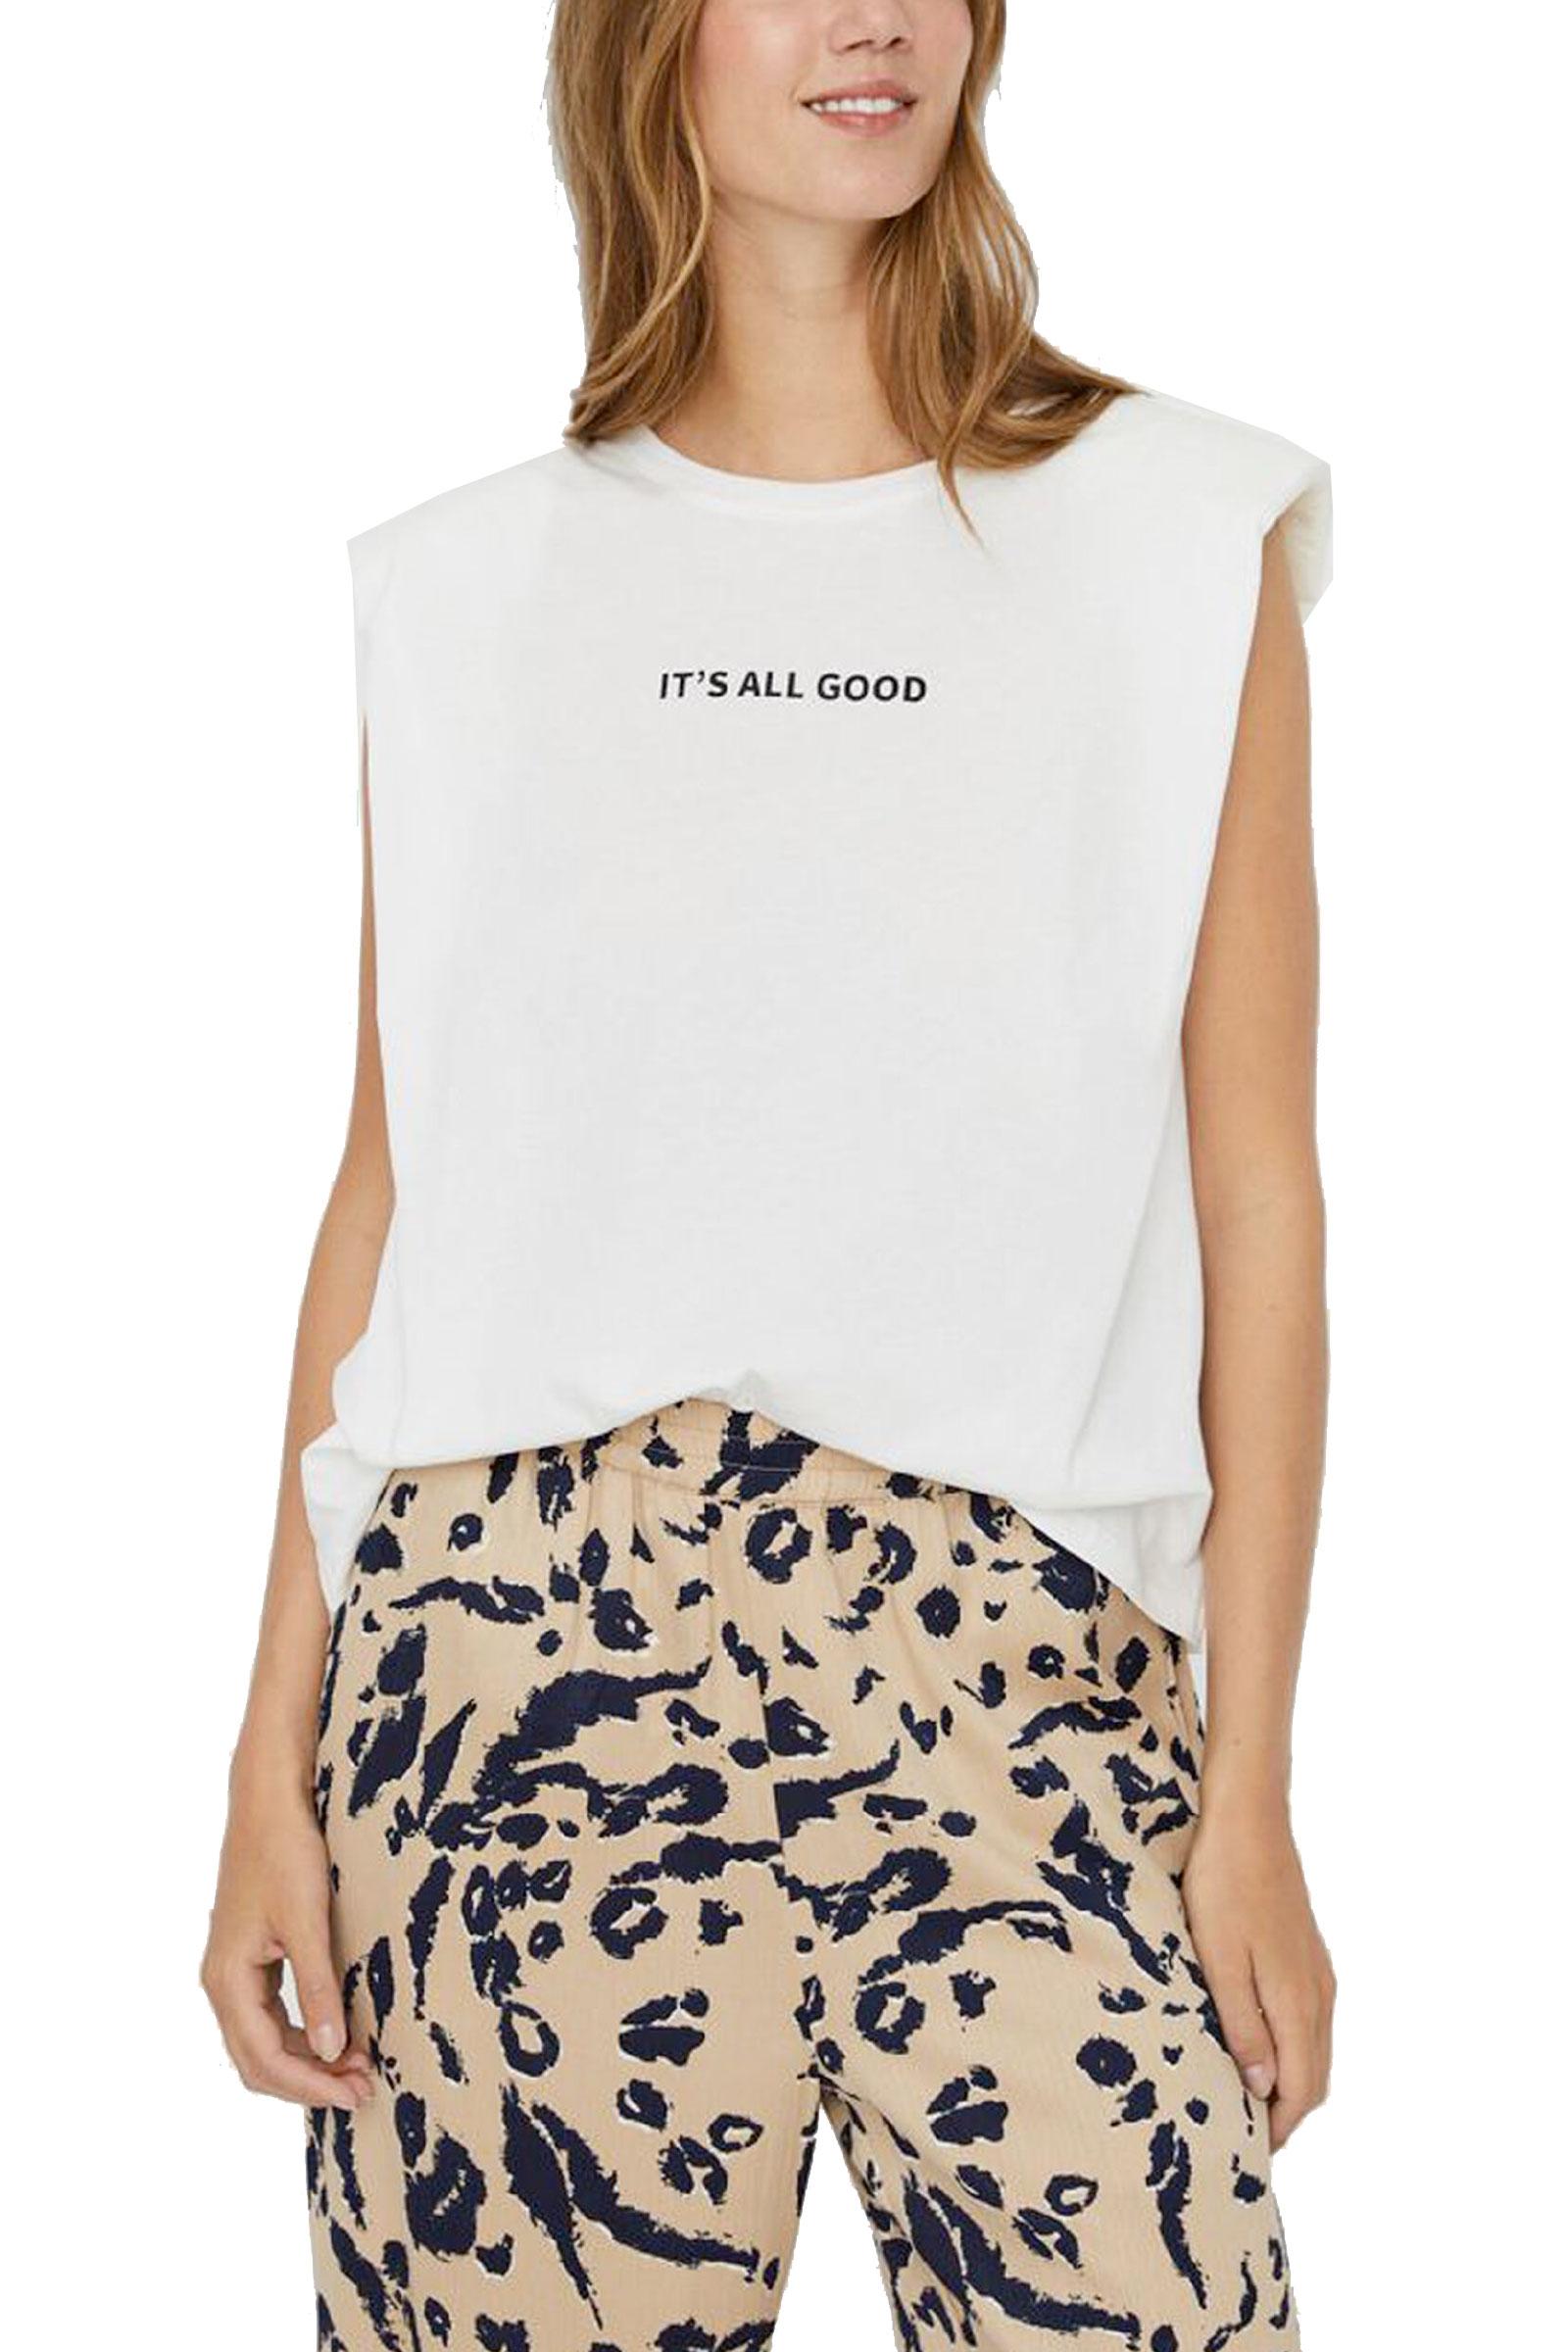 VERO MODA Women's T-Shirt VERO MODA | T-Shirt | 10245256Print-ITS ALL GOOD